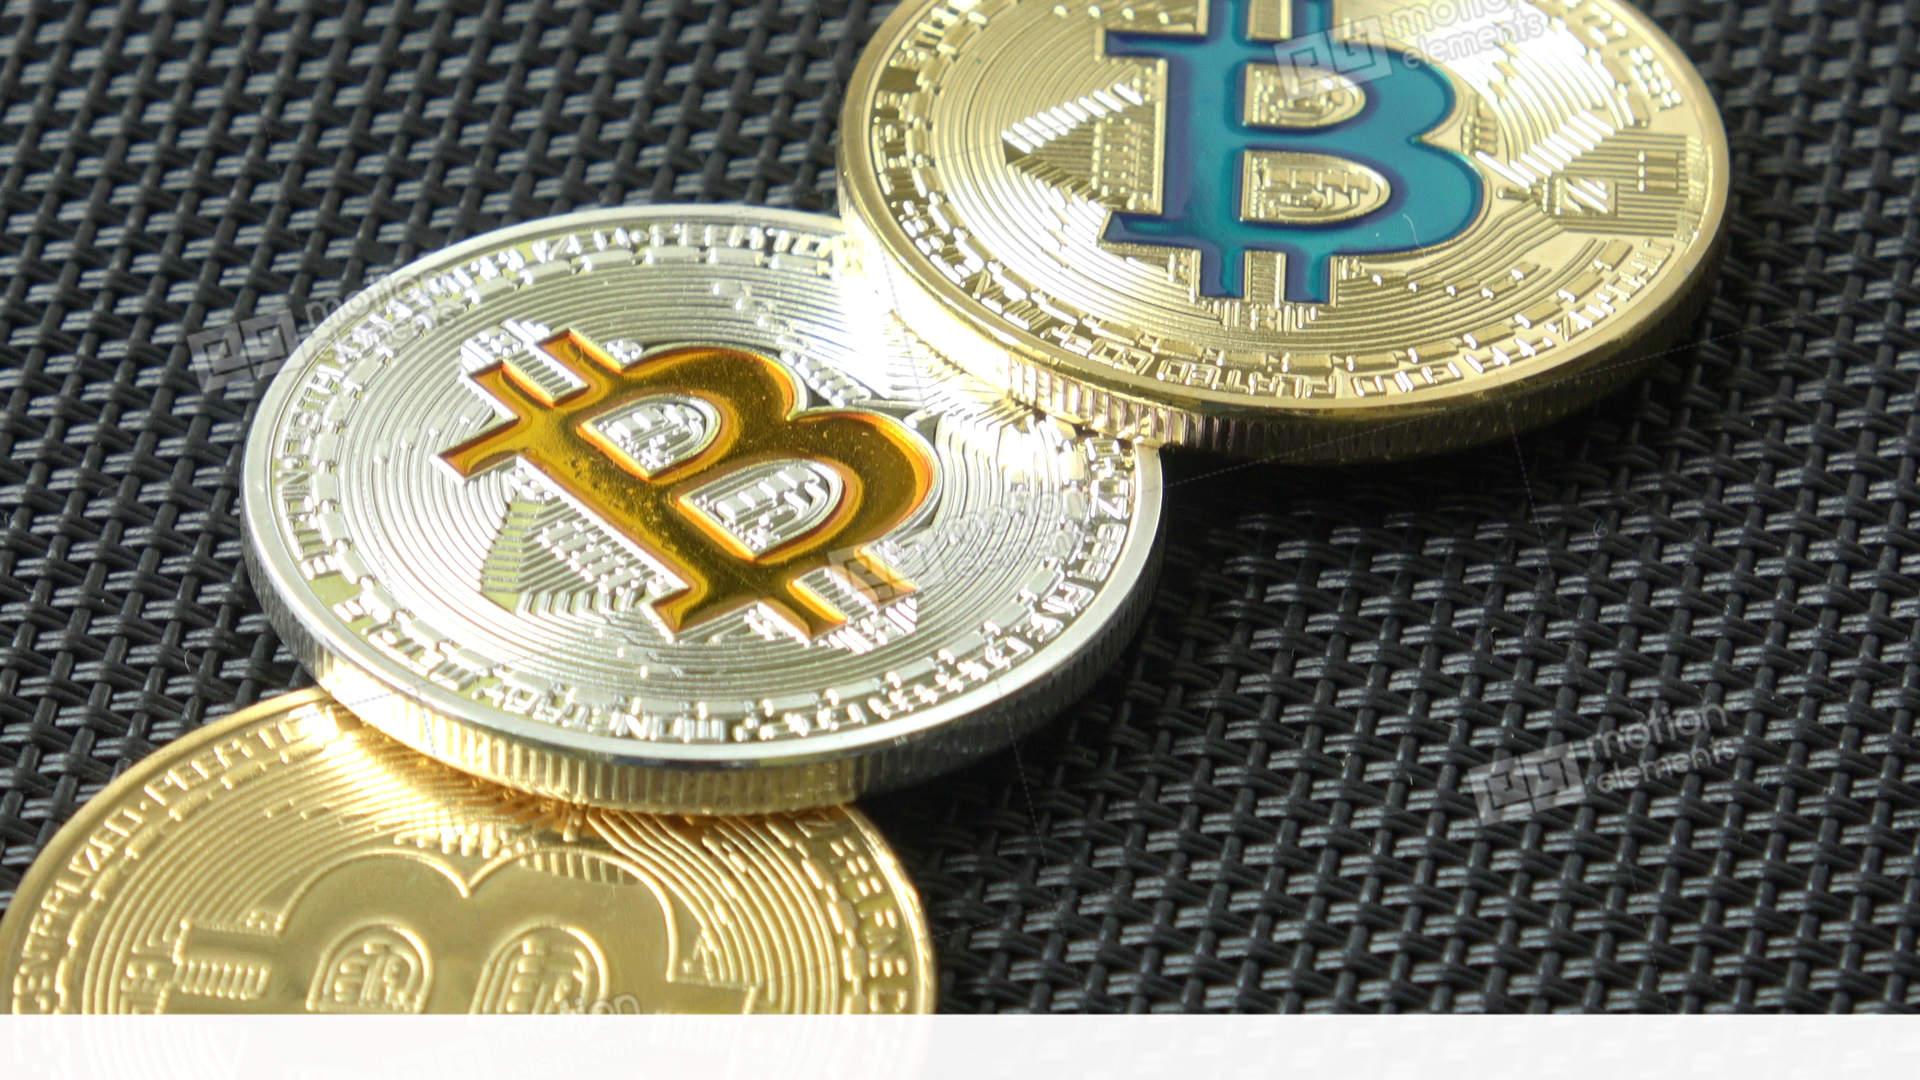 PEPECASH Pepe Cash coin